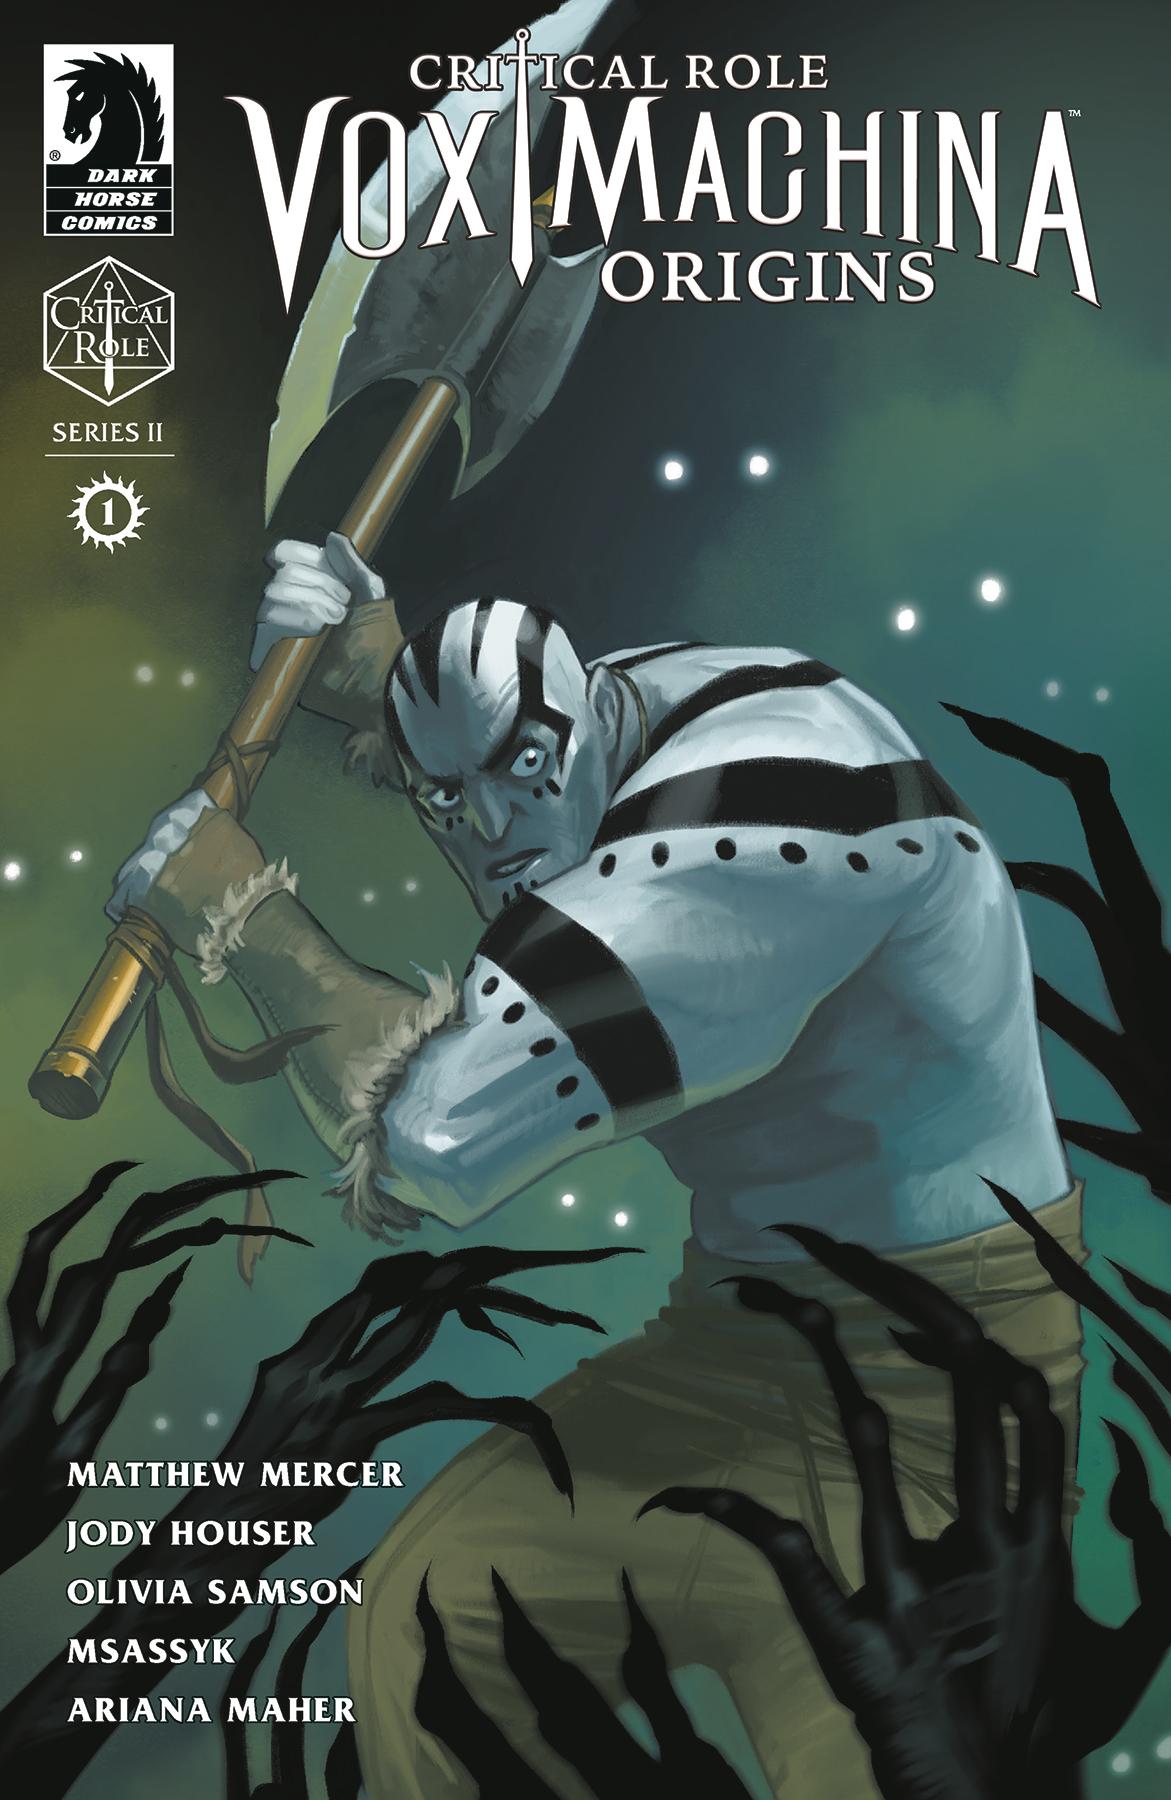 Critical Role: Vox Machina Origins II no. 1 (1 of 6) (2019 Series)